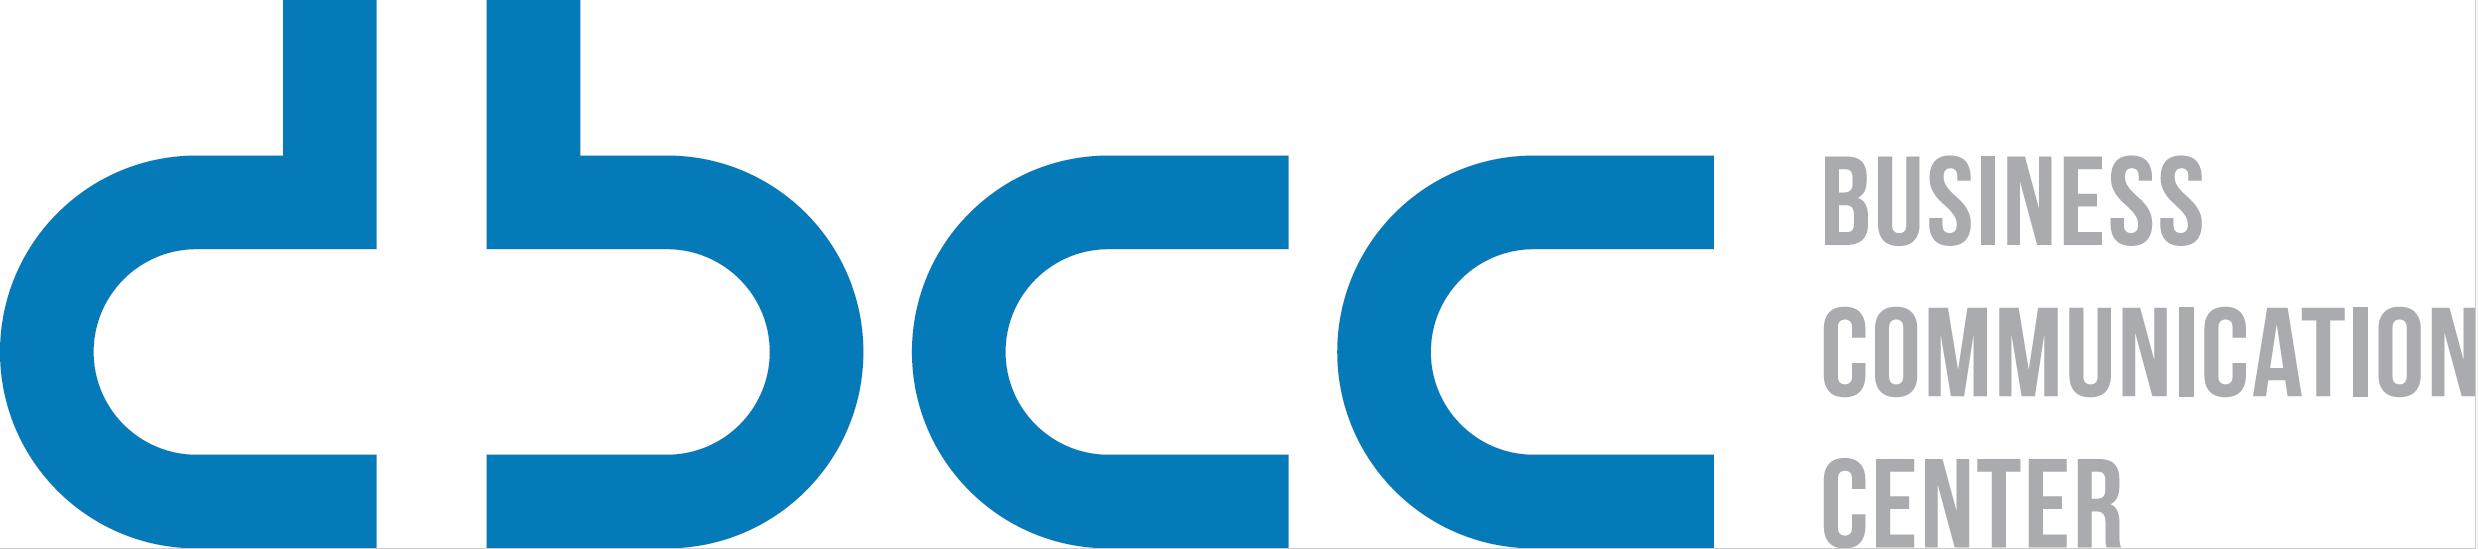 DREI Business Communication Center